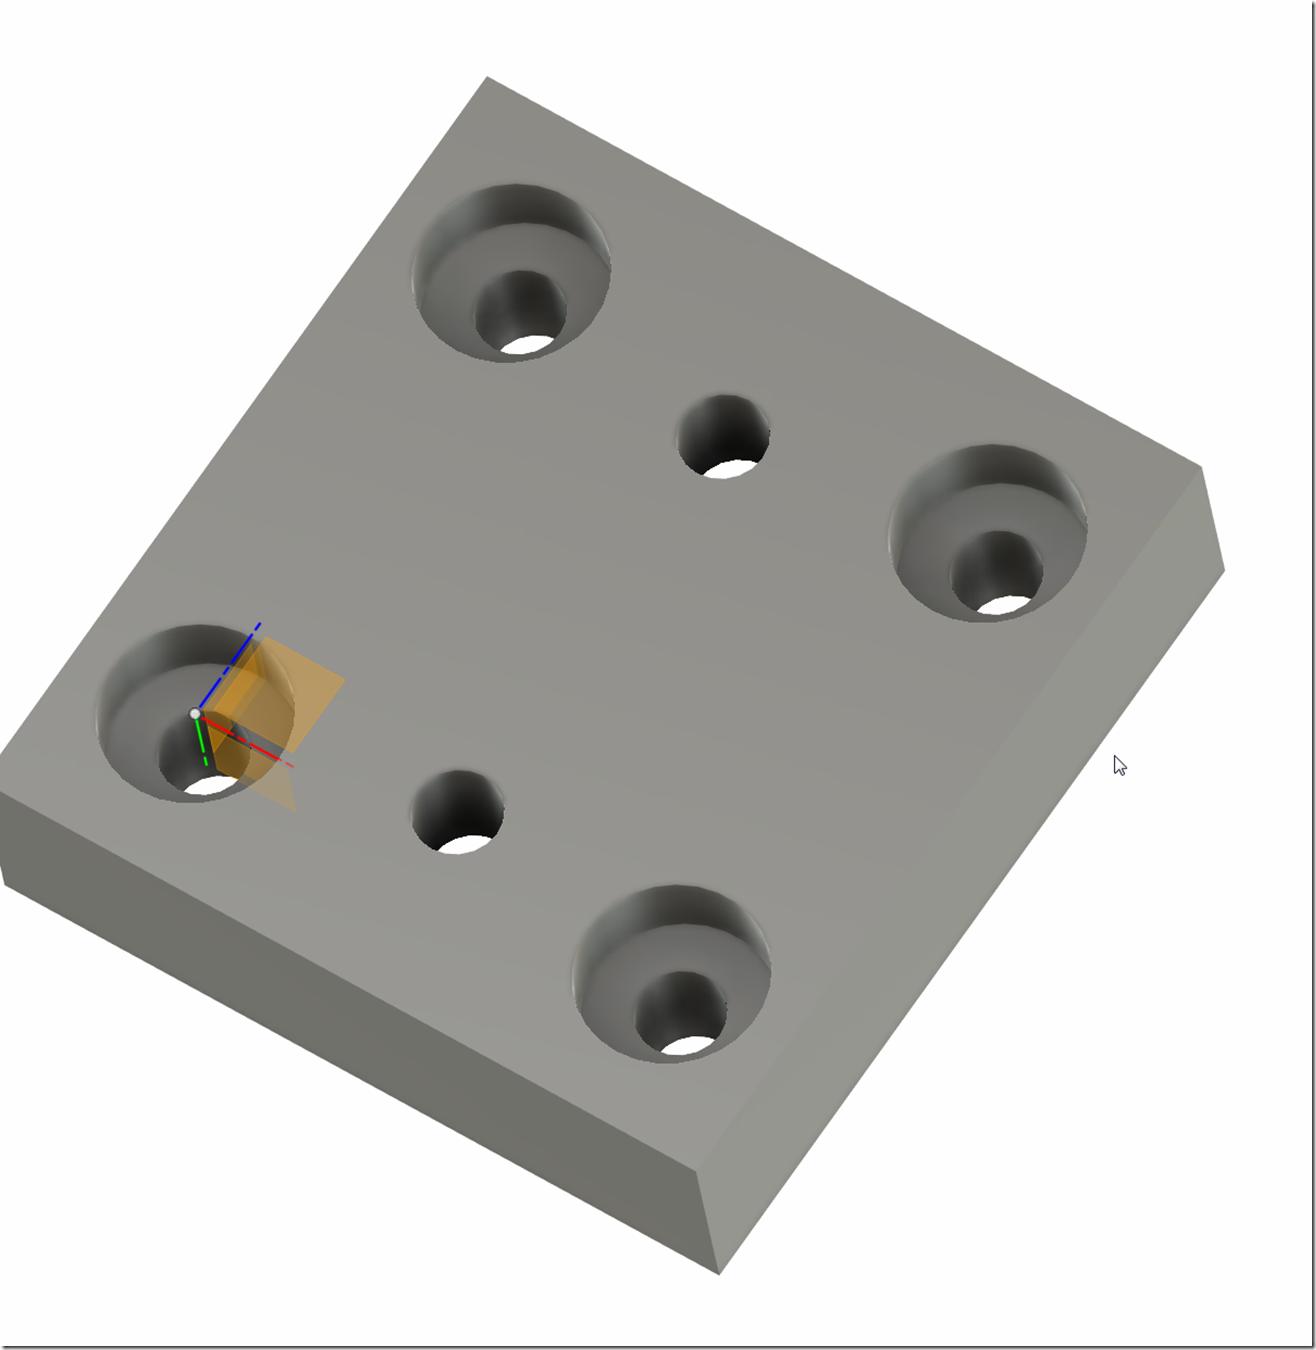 2020-06-06 19_21_37-Autodesk Fusion 360